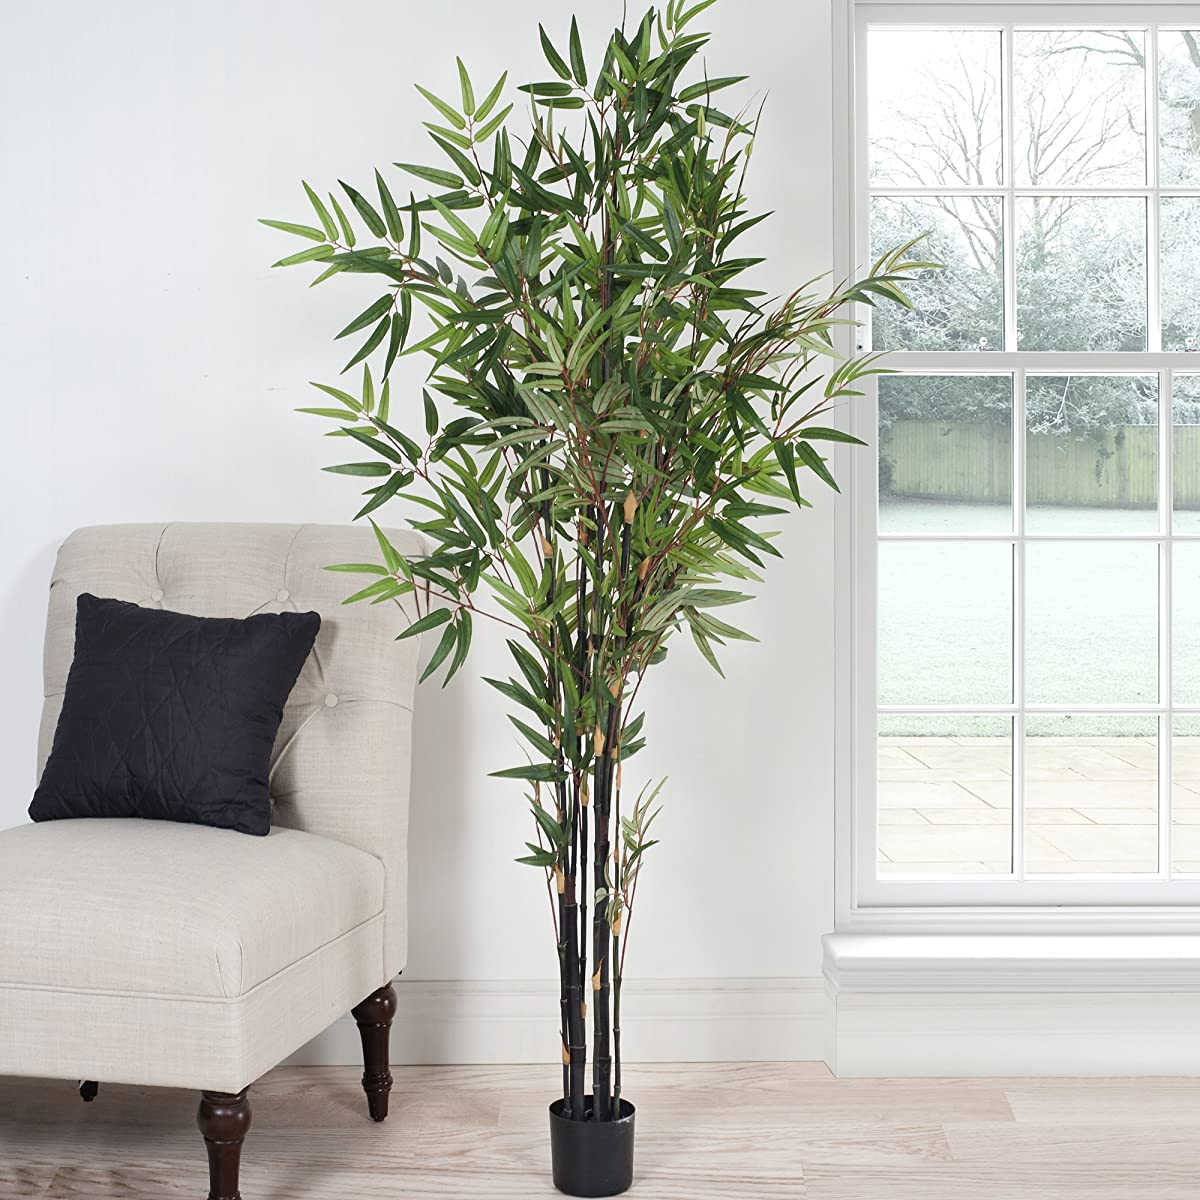 Pure Garden 5 Foot Japanese Bamboo Artificial Tree